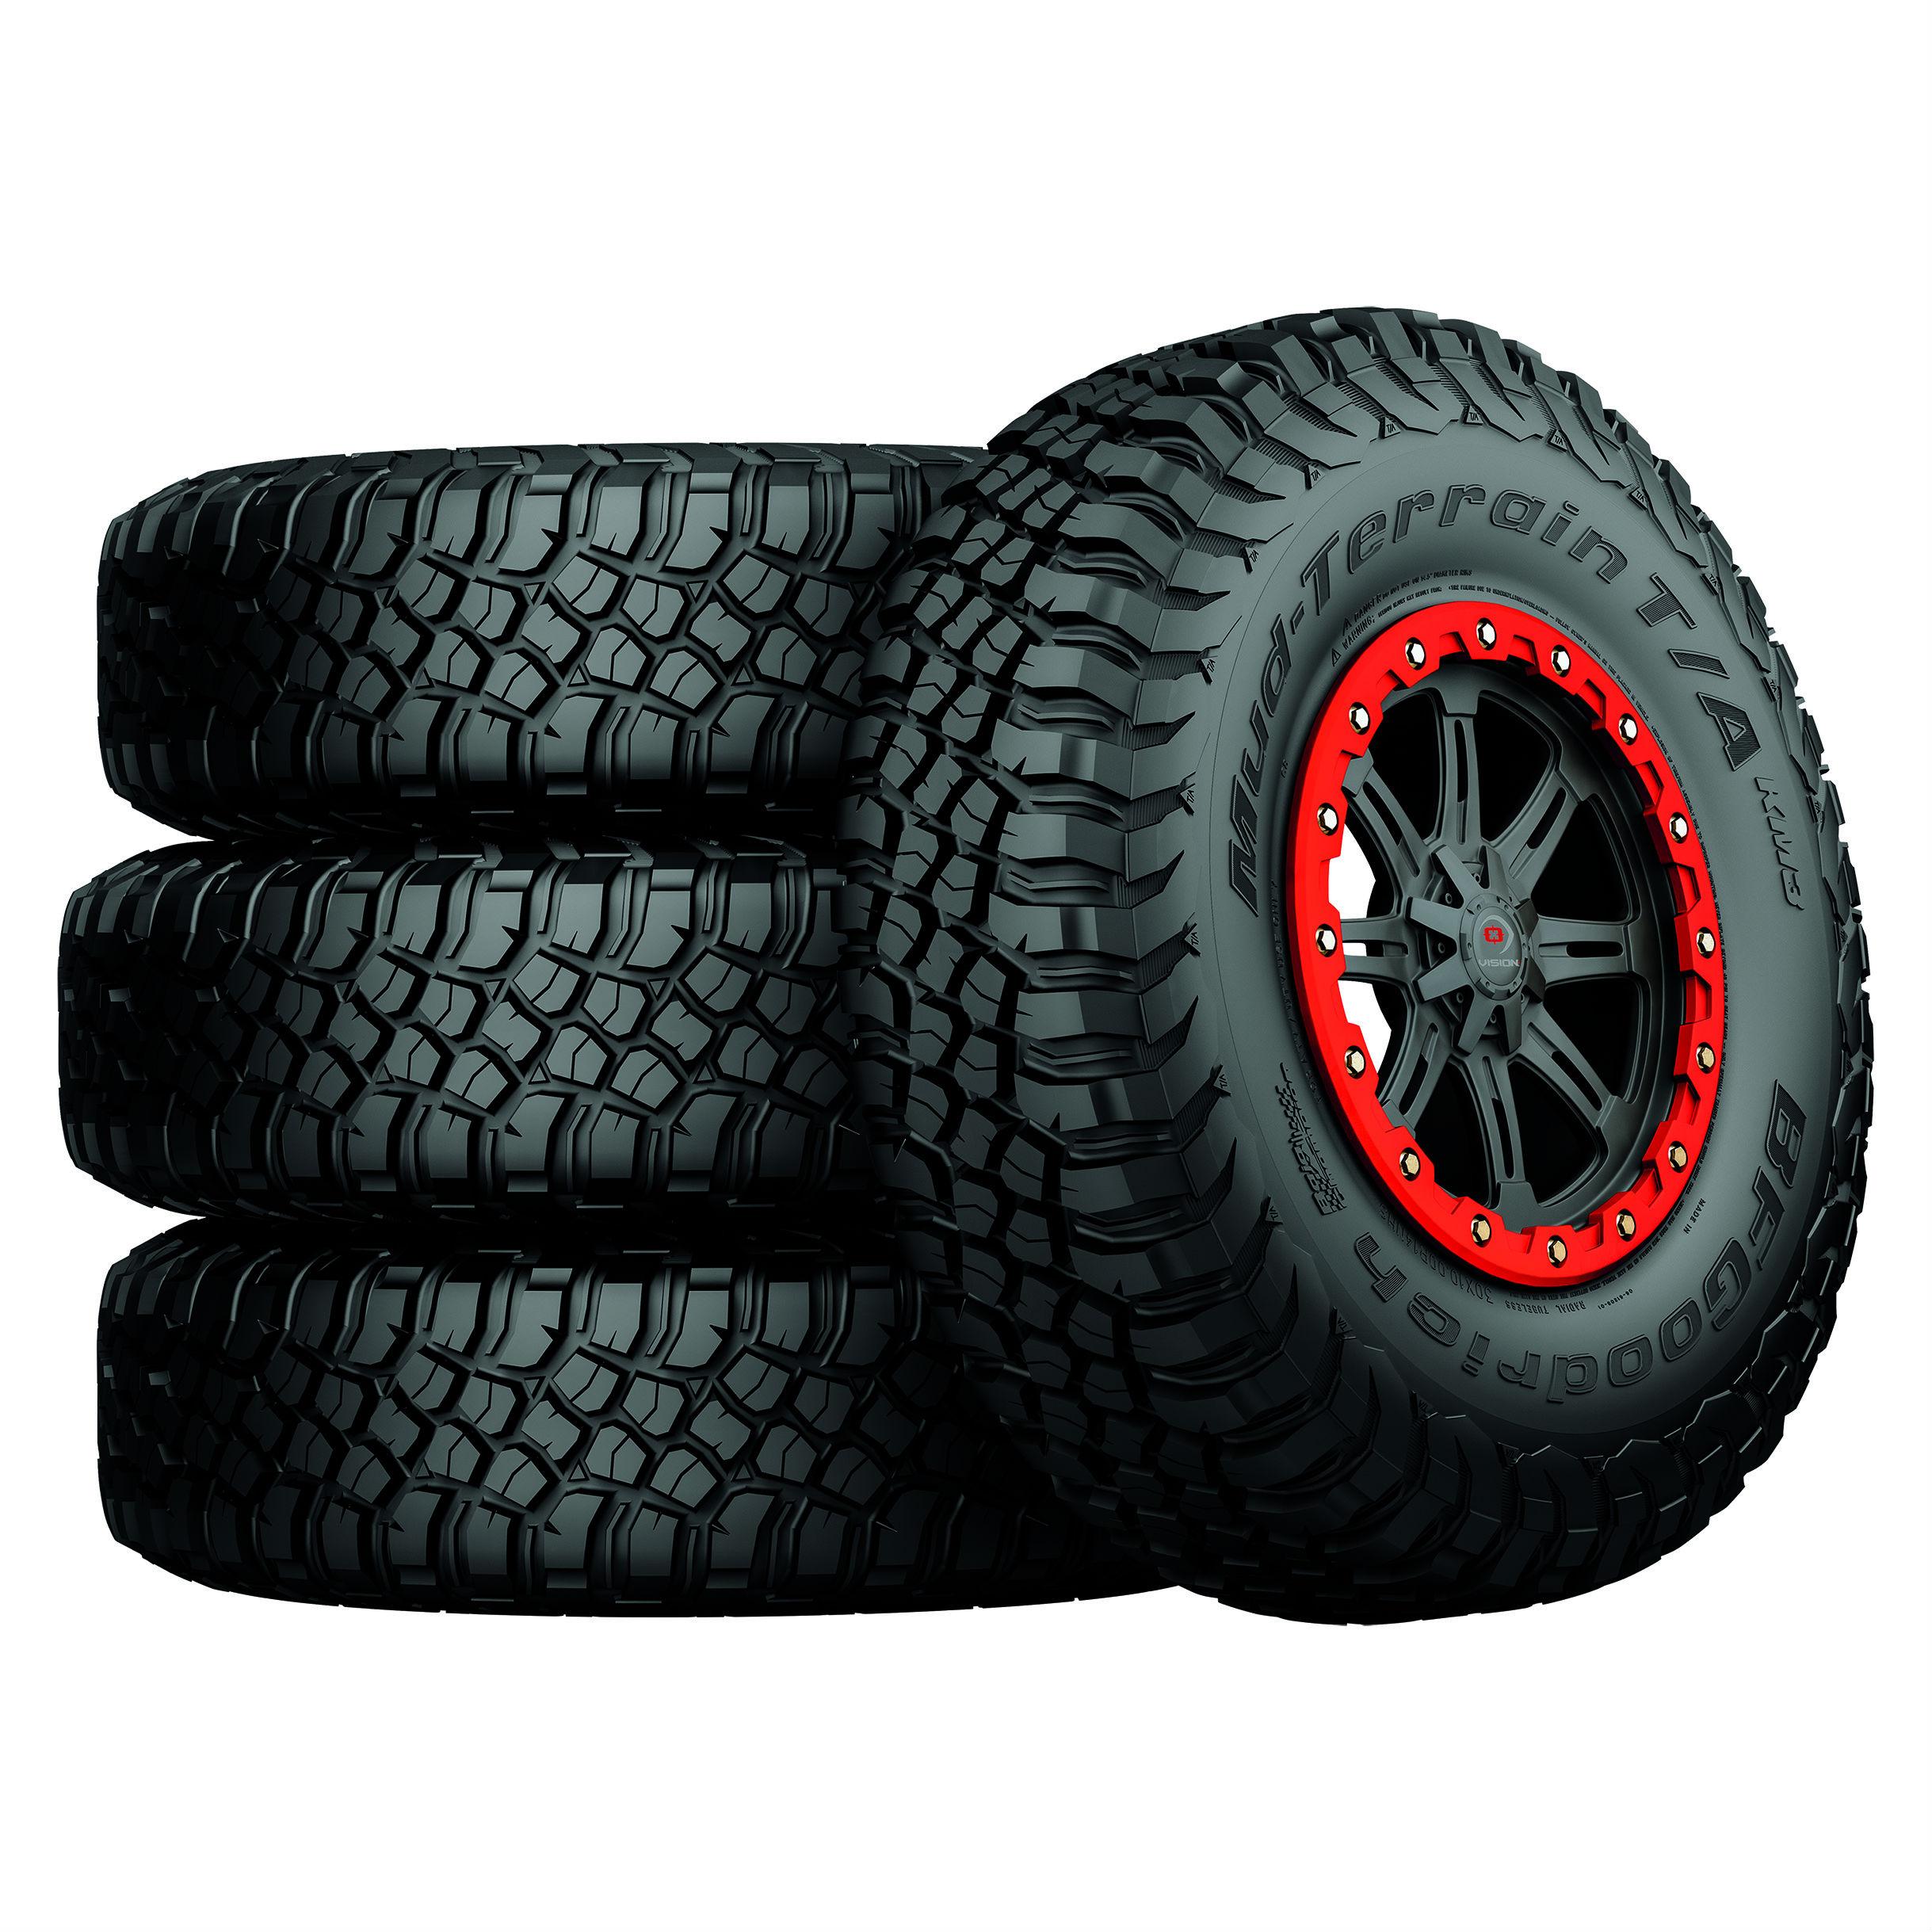 Utv And Atv Tire Size Explained Are Bigger Tires Better Chapmoto Com